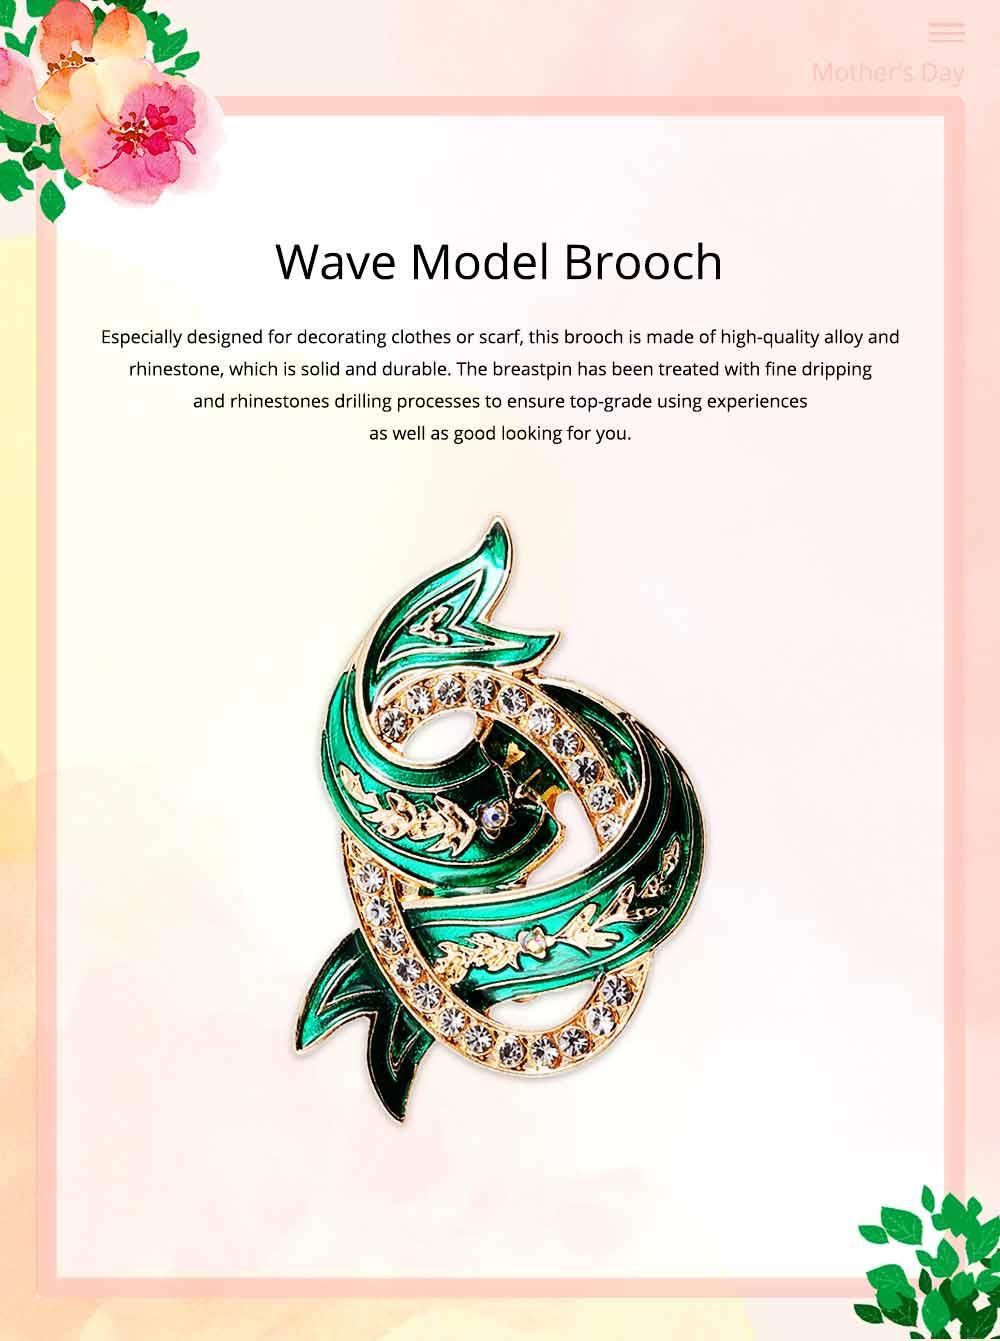 Elegant Green Wave Model Rhinestone Embellishment Alloy Brooch for Women, Scarf Clothes Ornament Accessories Breastpin Women Jewelry 0